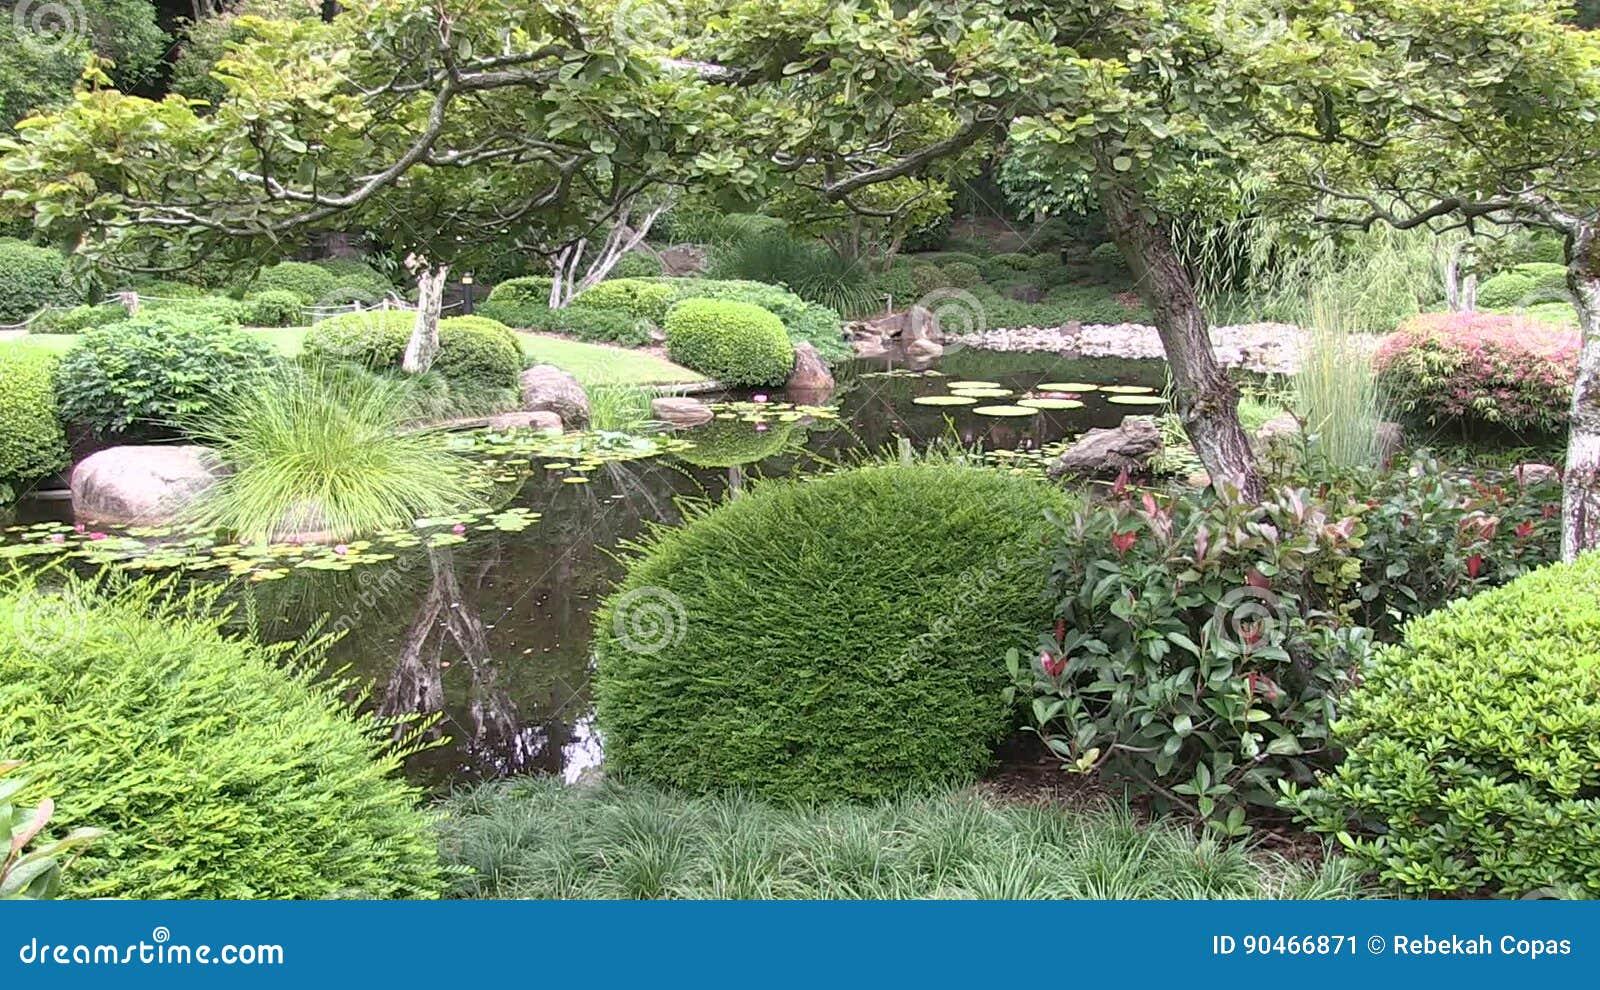 A Formal Japanese Garden In Australia At Brisbane S Mount Coo Tha Botanic Gardens Stock Video Video Of Australia Shrub 90466871